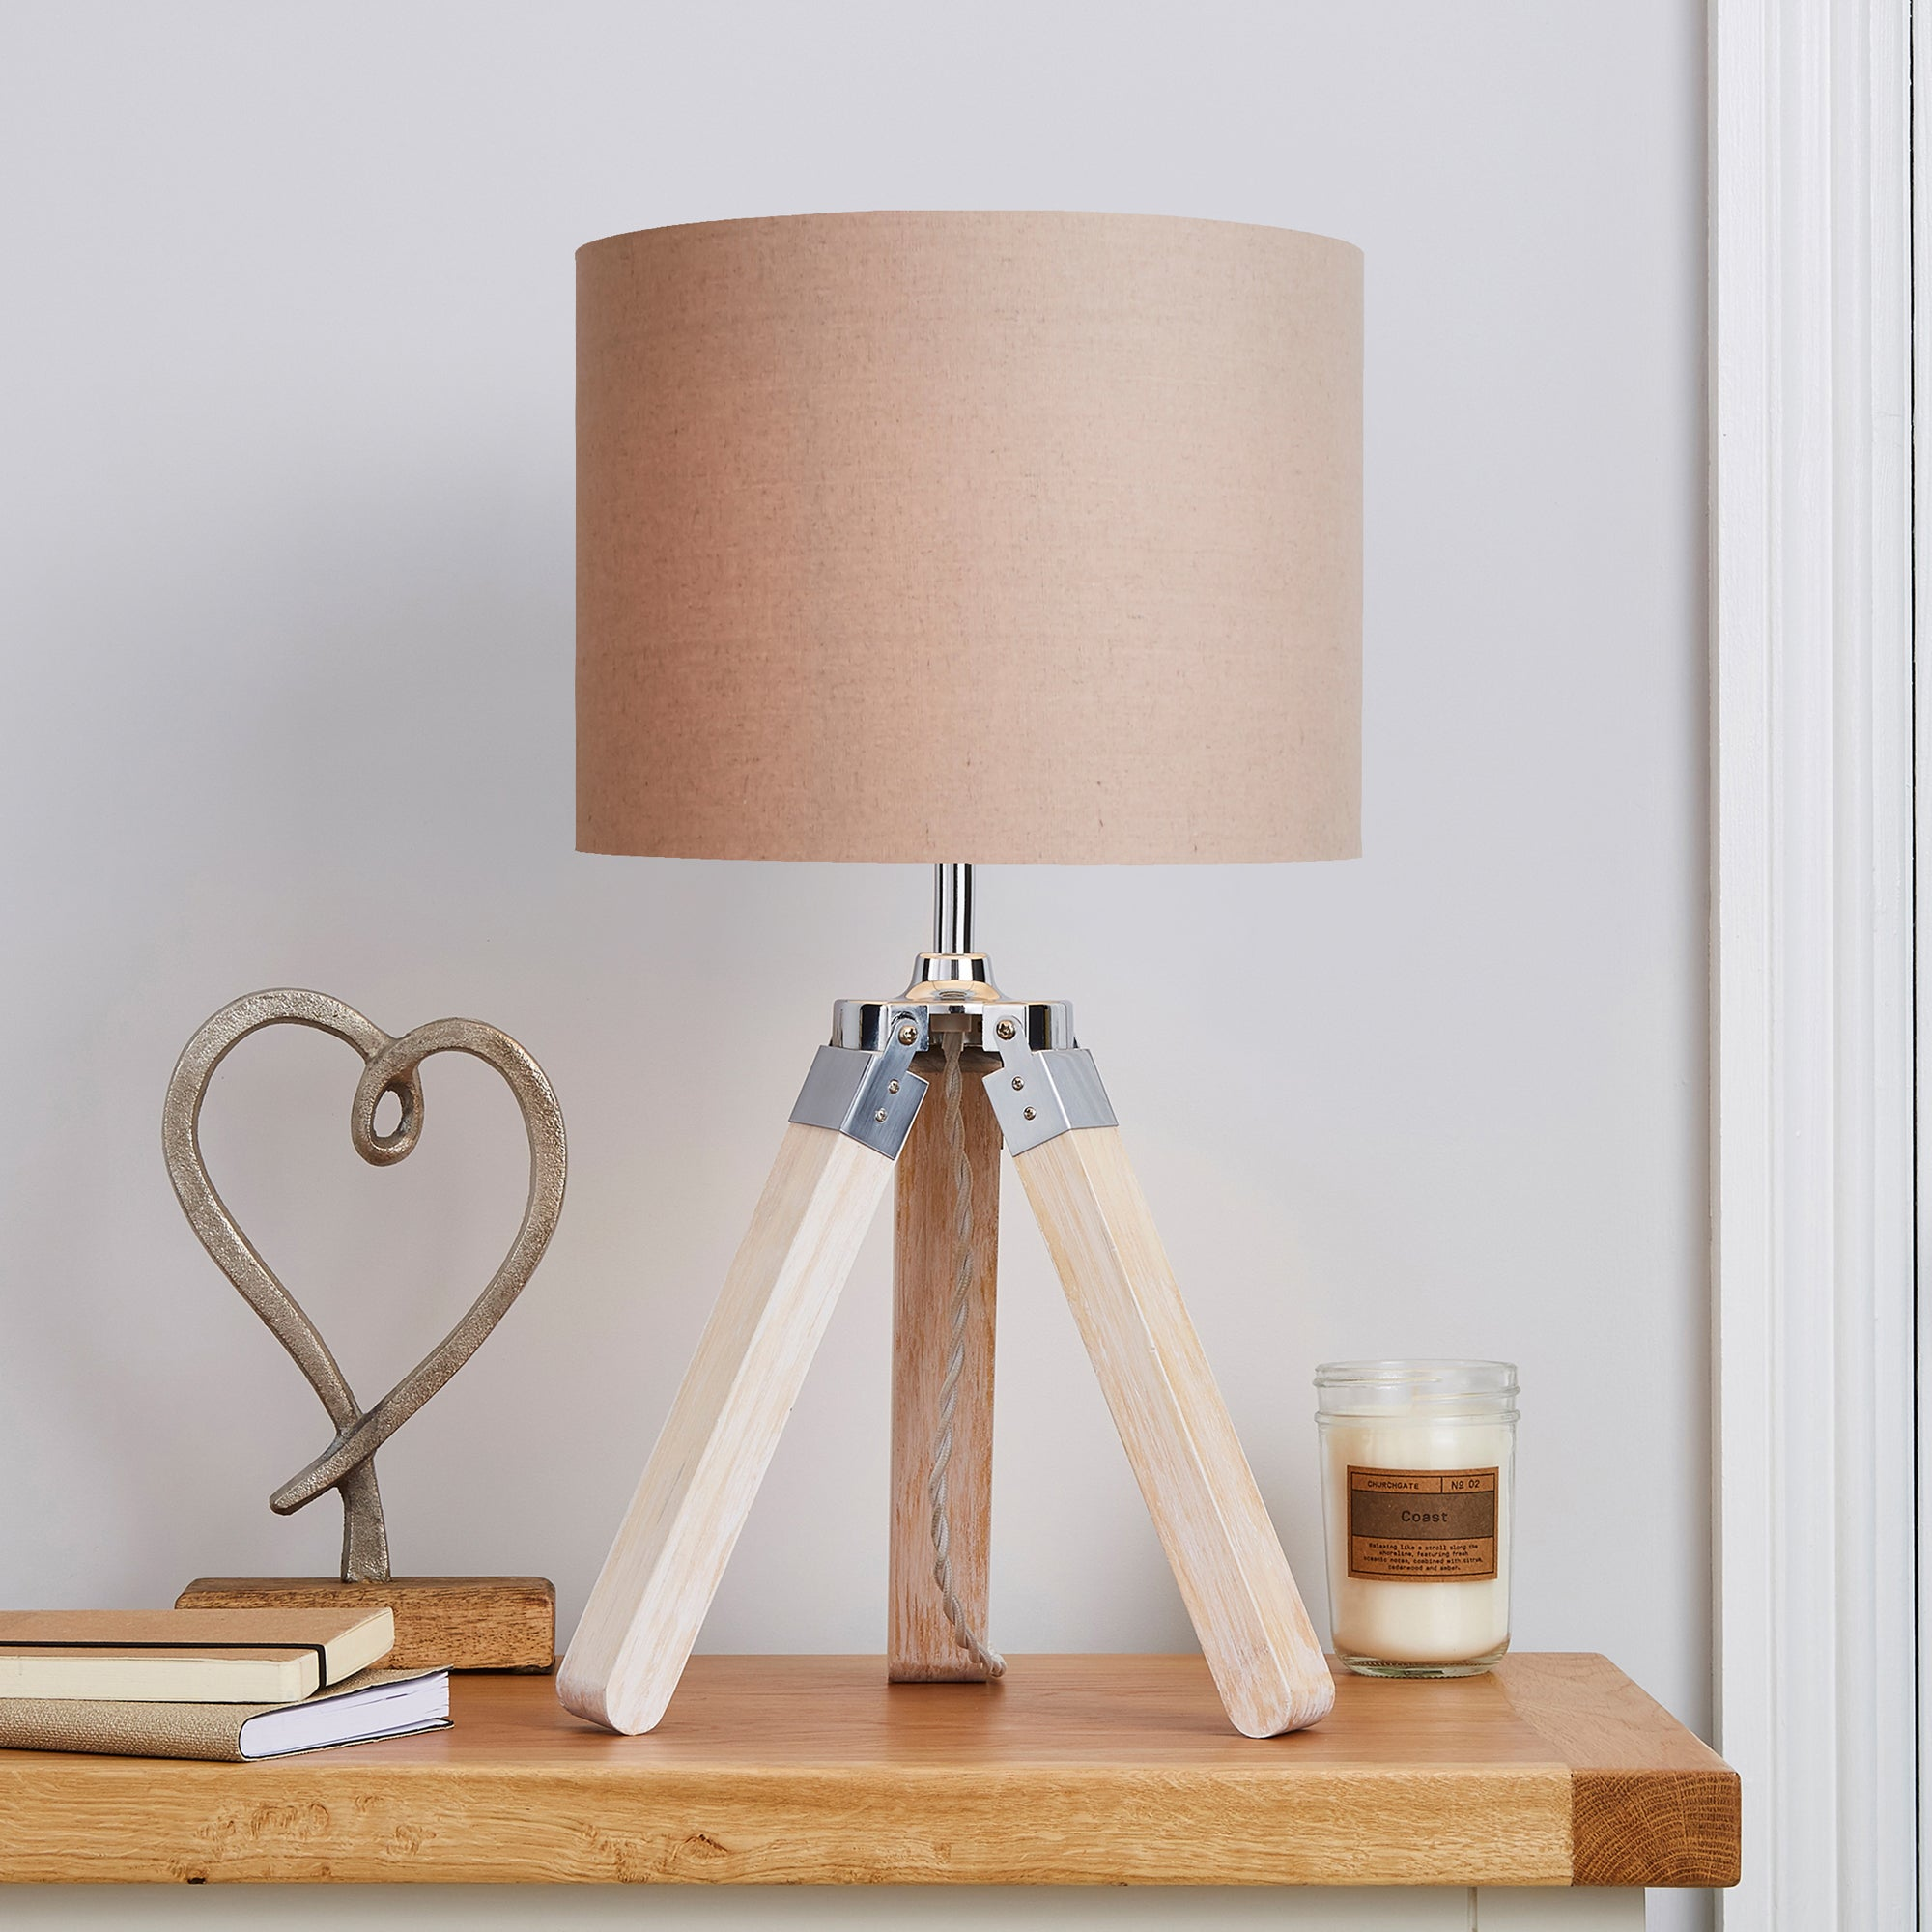 Trio Tripod Light Wood Table Lamp Brown